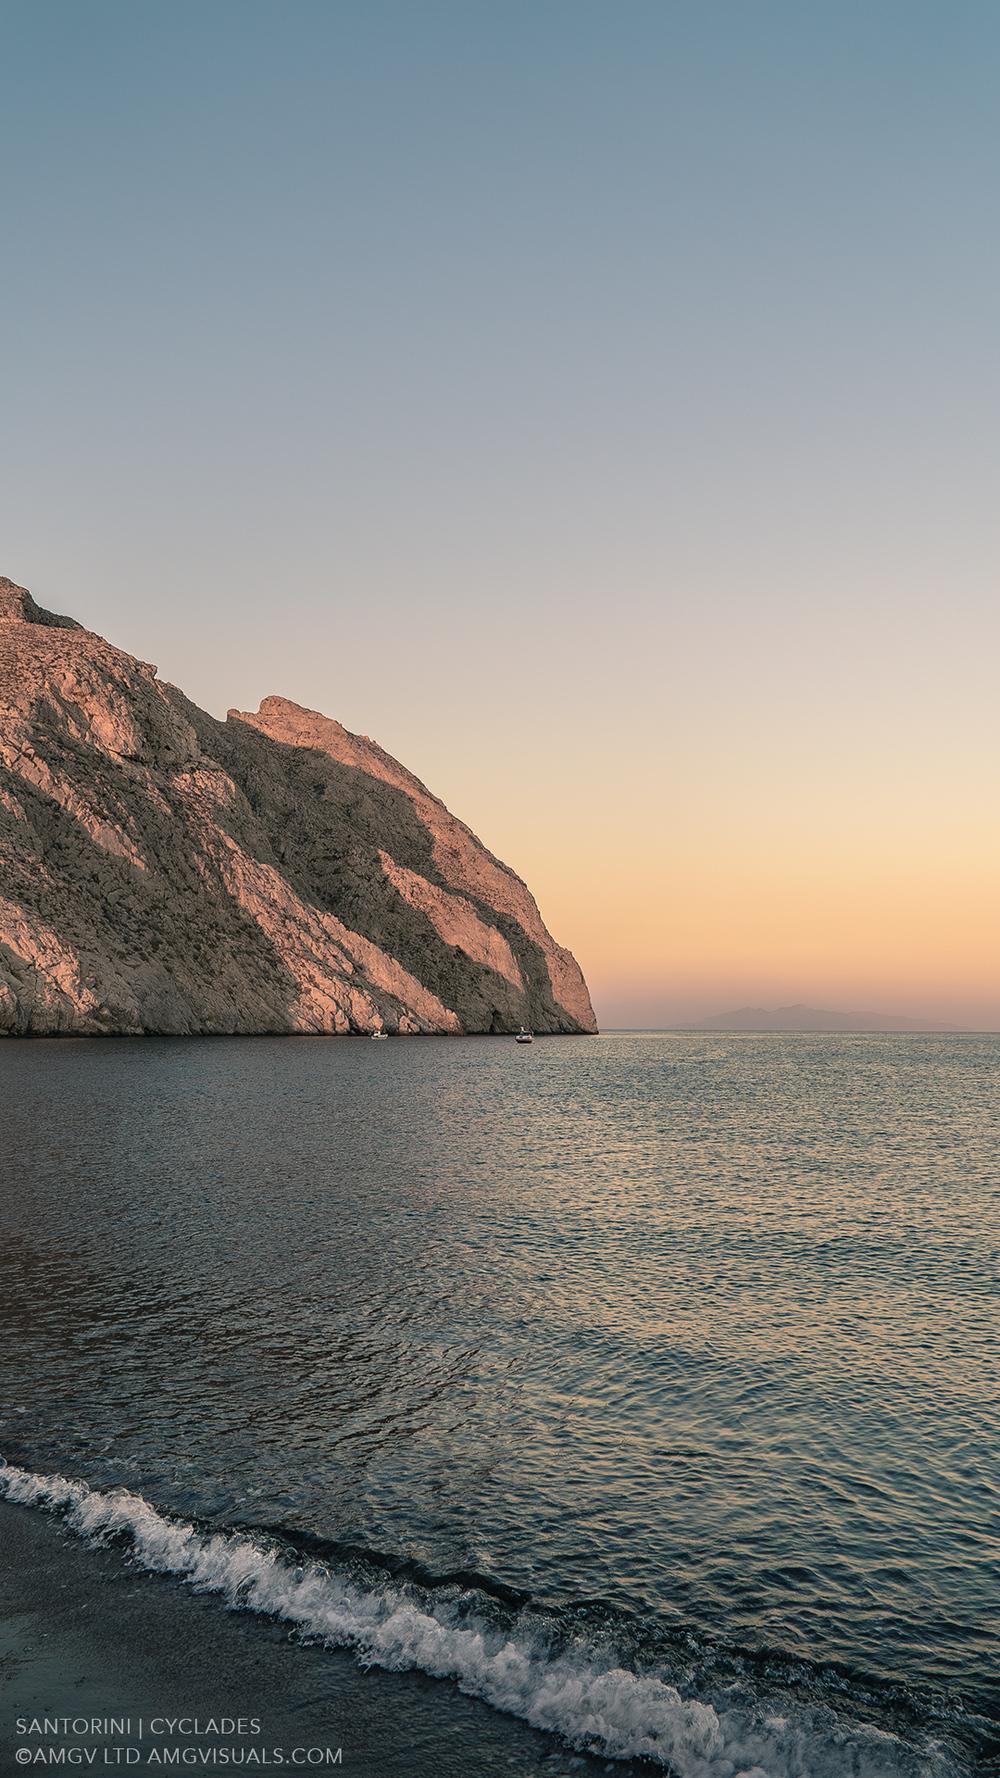 ©AMGV-LTD-Santorini+Cyclades-1.jpg